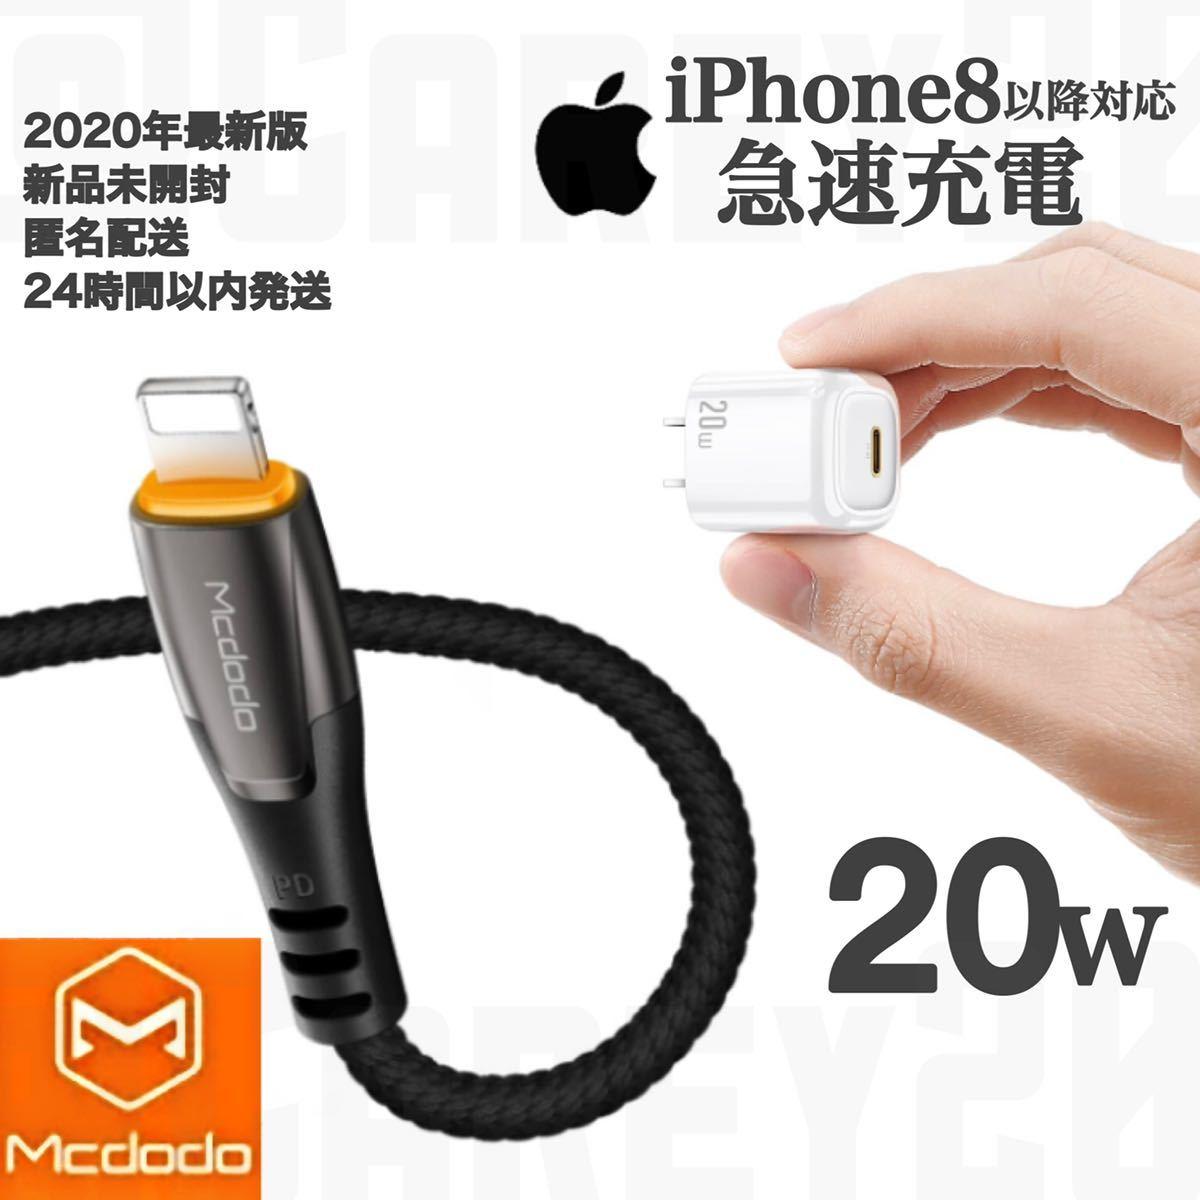 【iPhone 急速充電 セット】 ハイスペック ライトニングケーブル36w & USB-C 充電 アダプター20w 白 iPhone12 急速 充電器 電源 アダプタ